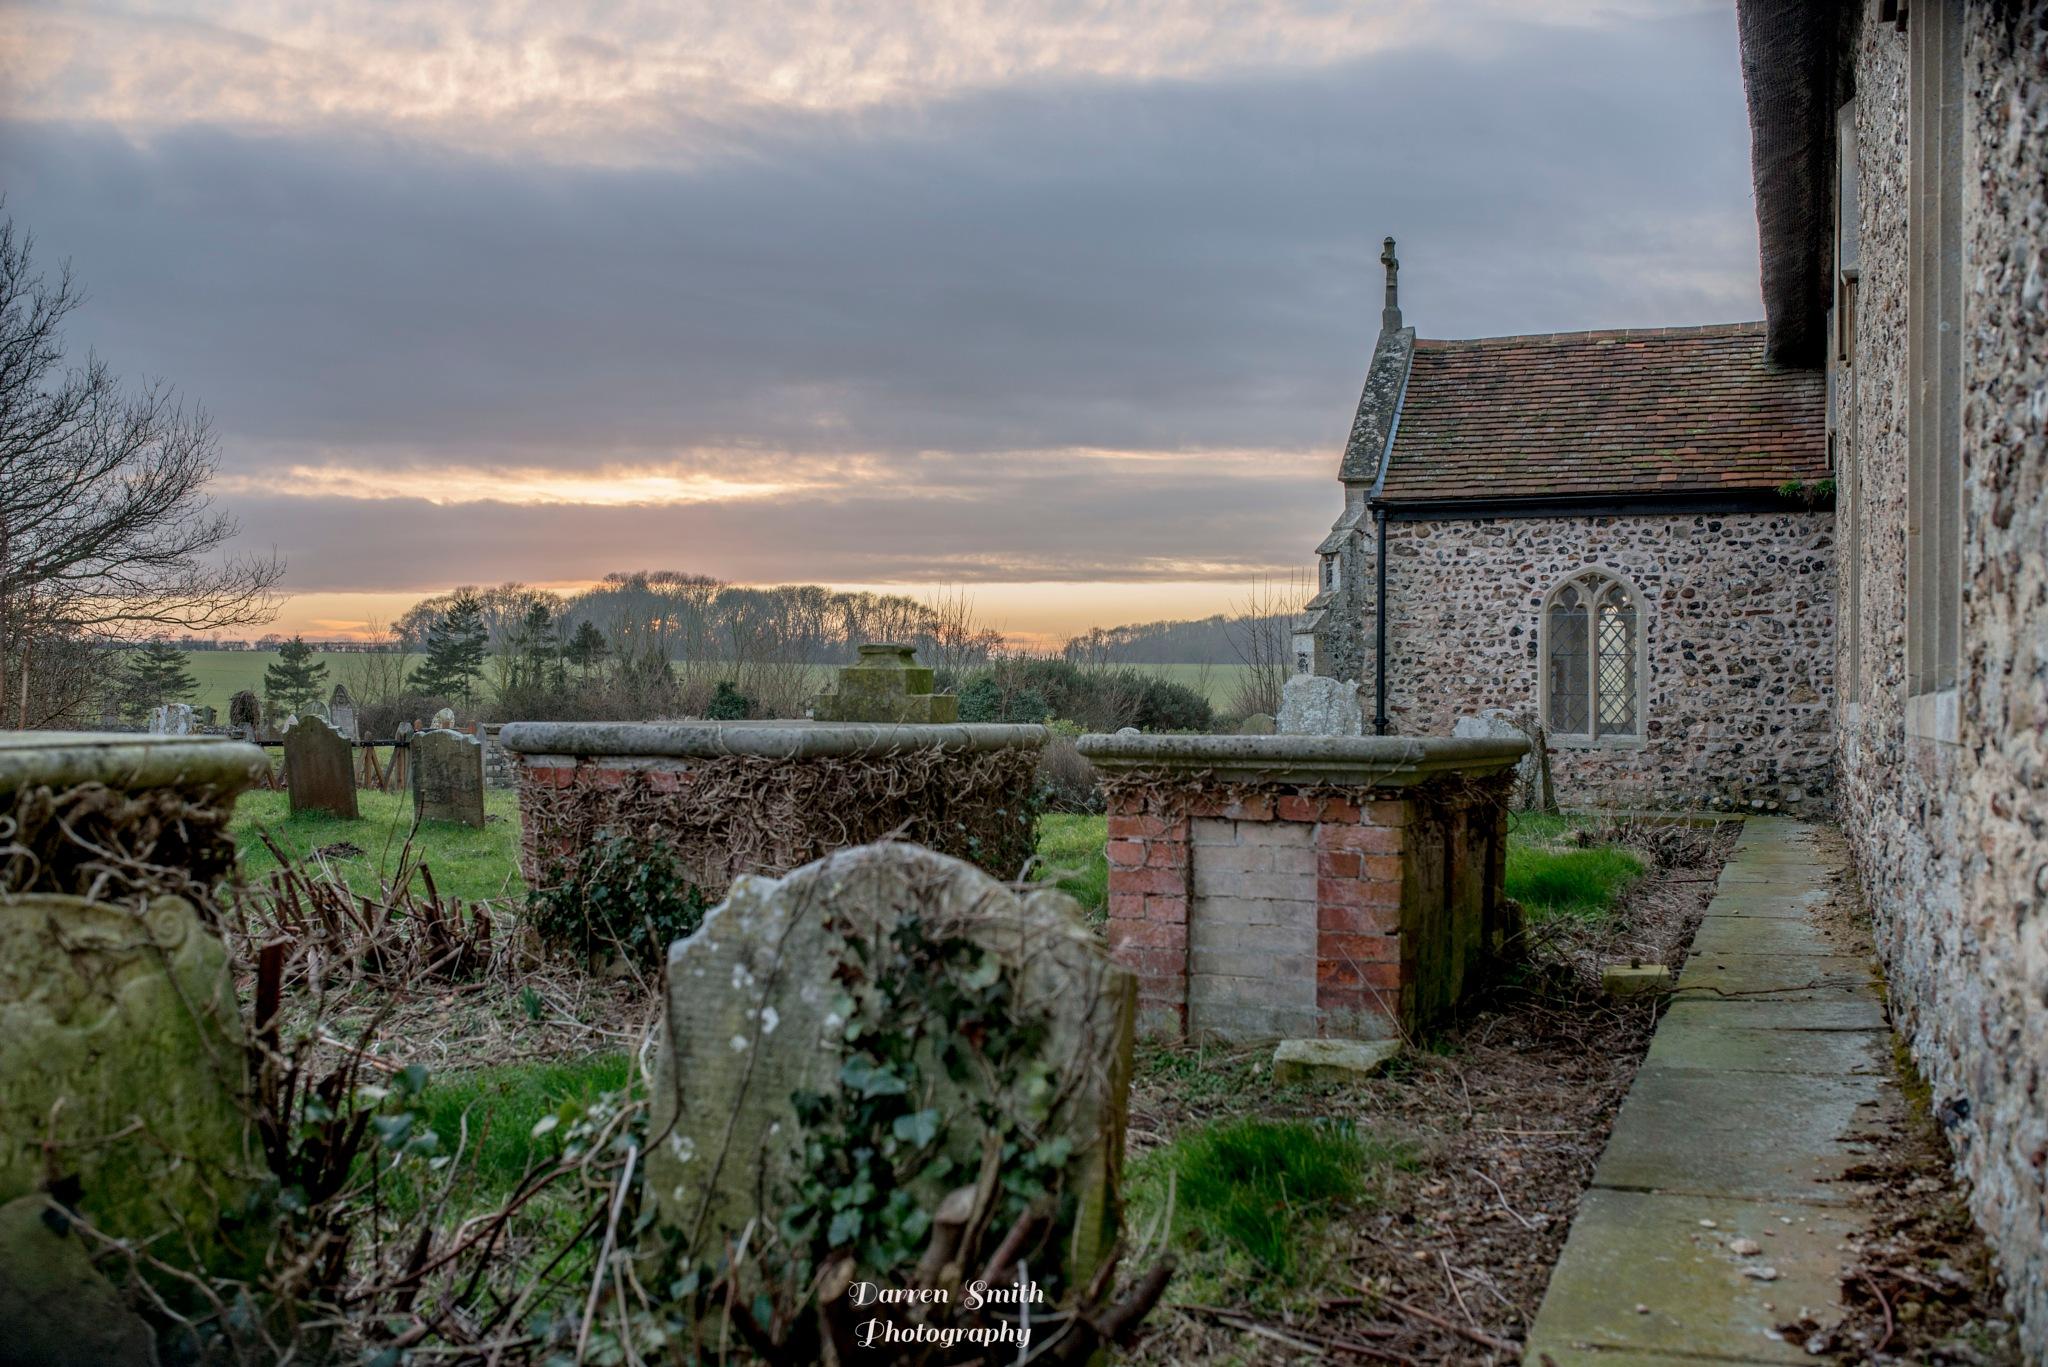 Cemetery Sunset by Darren Smith